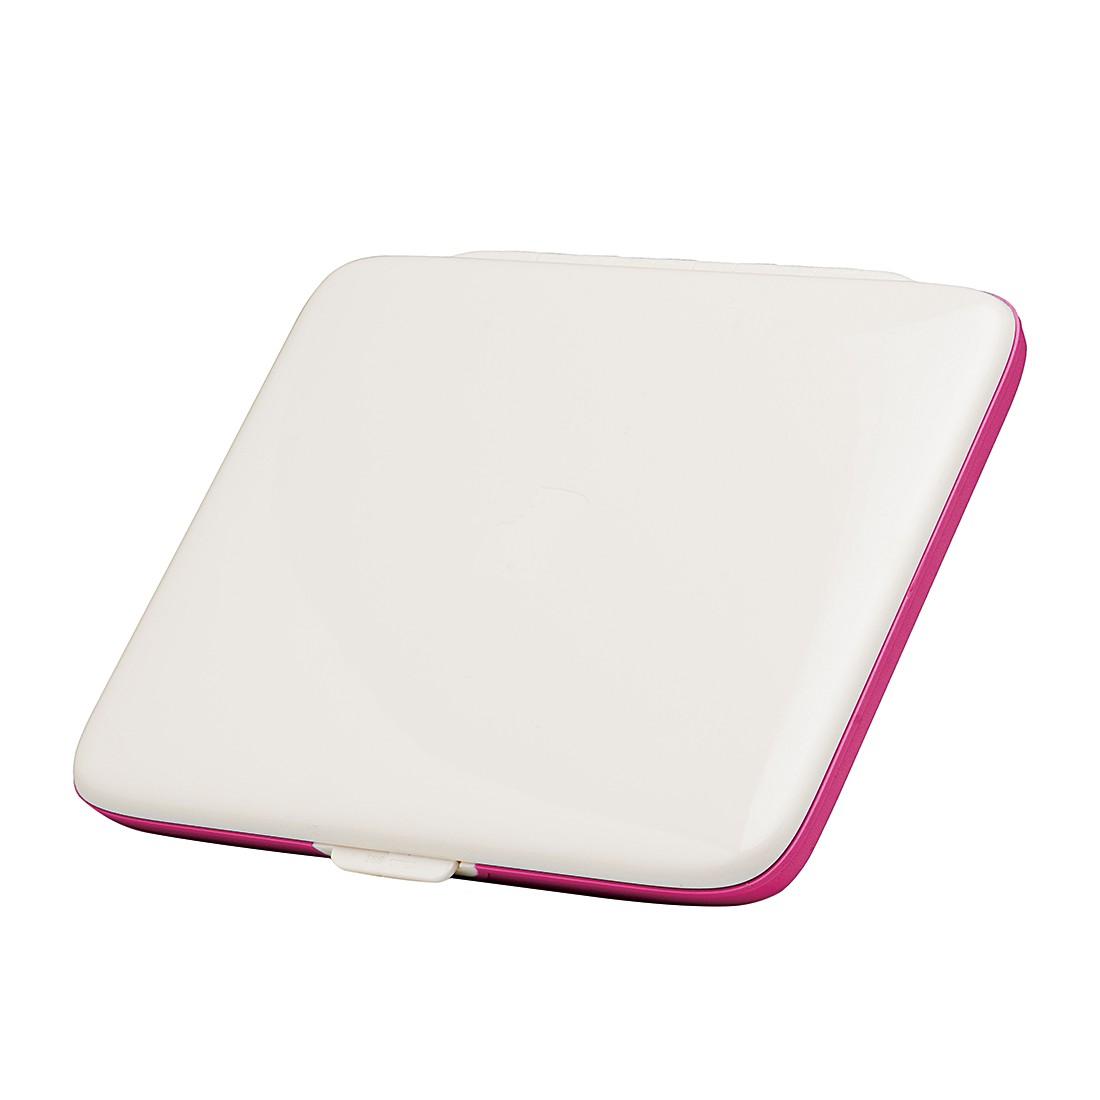 Lunchbox Foodbook – Kunststoff – Pink, Unikia kaufen